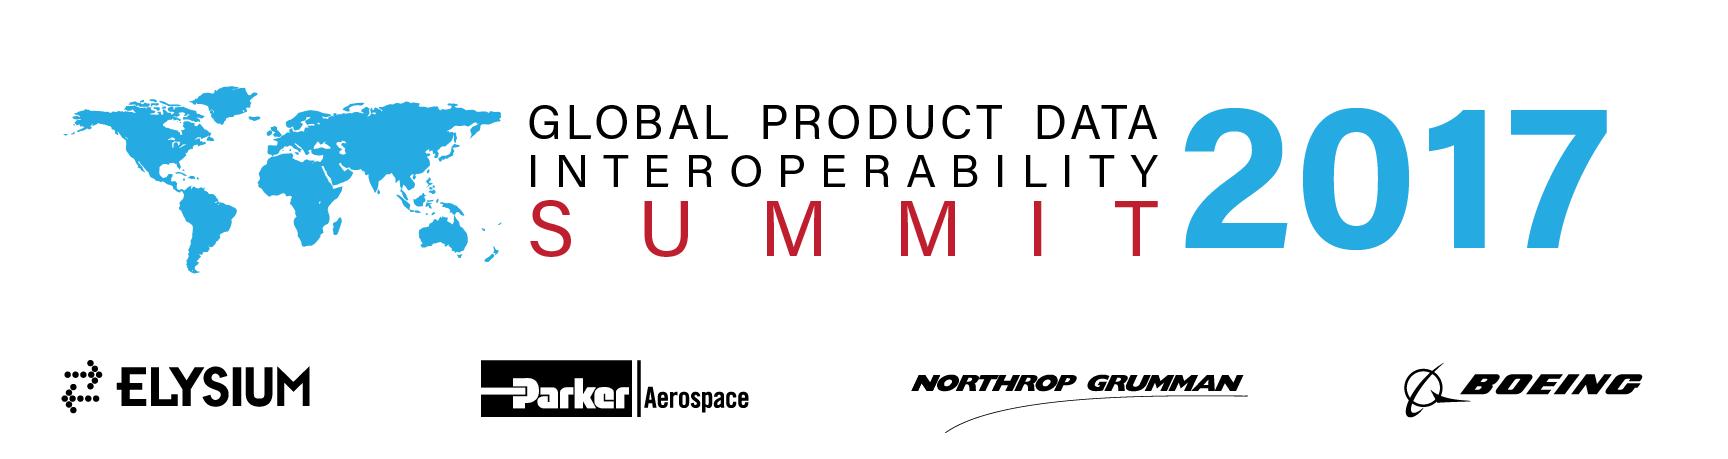 GLOBAL PRODUCT DATA INTEROPERATABILITY SUMMIT